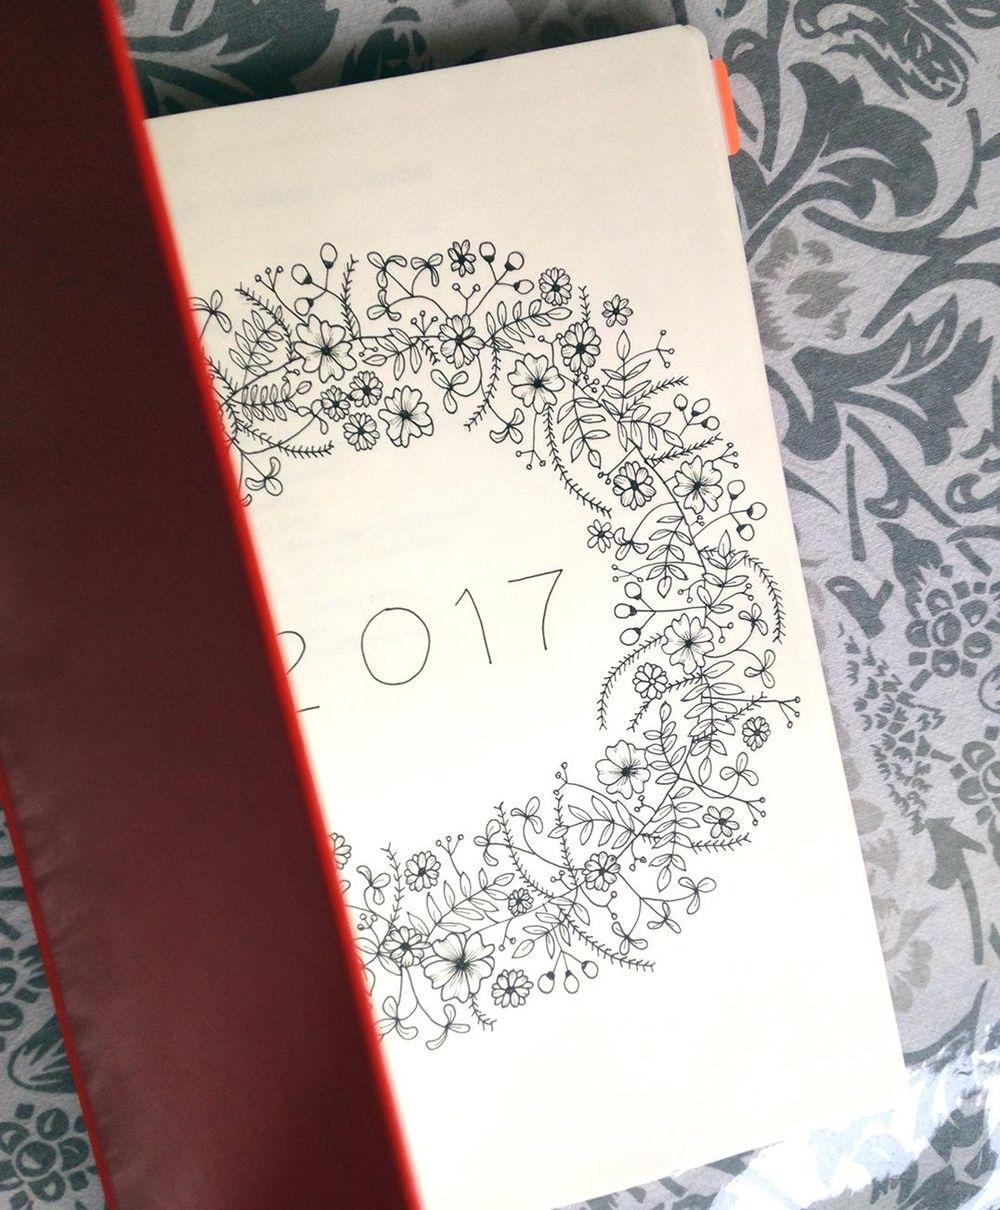 Bullet Journal Botanicals - image 1 - student project